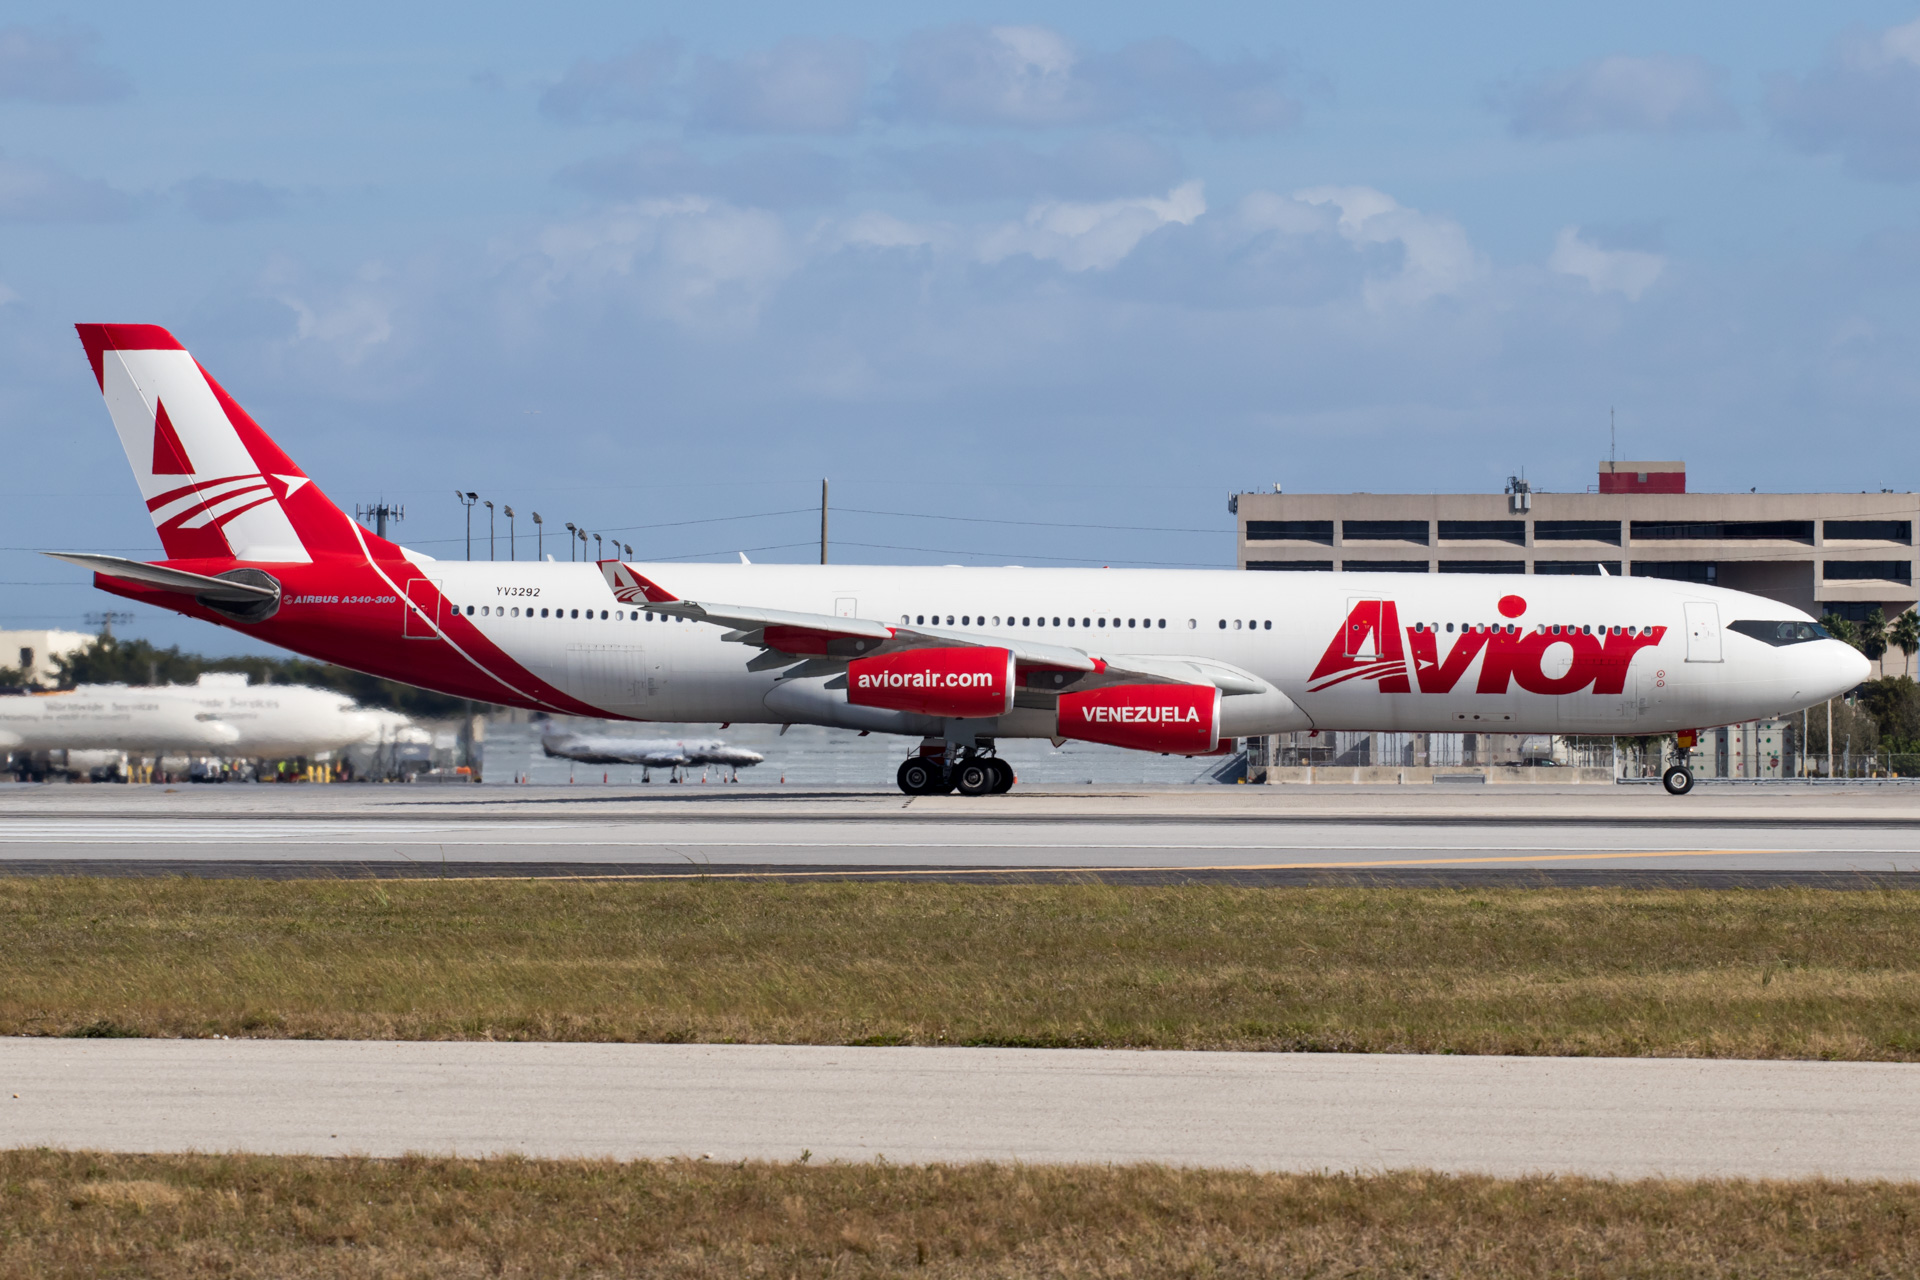 Avior A340